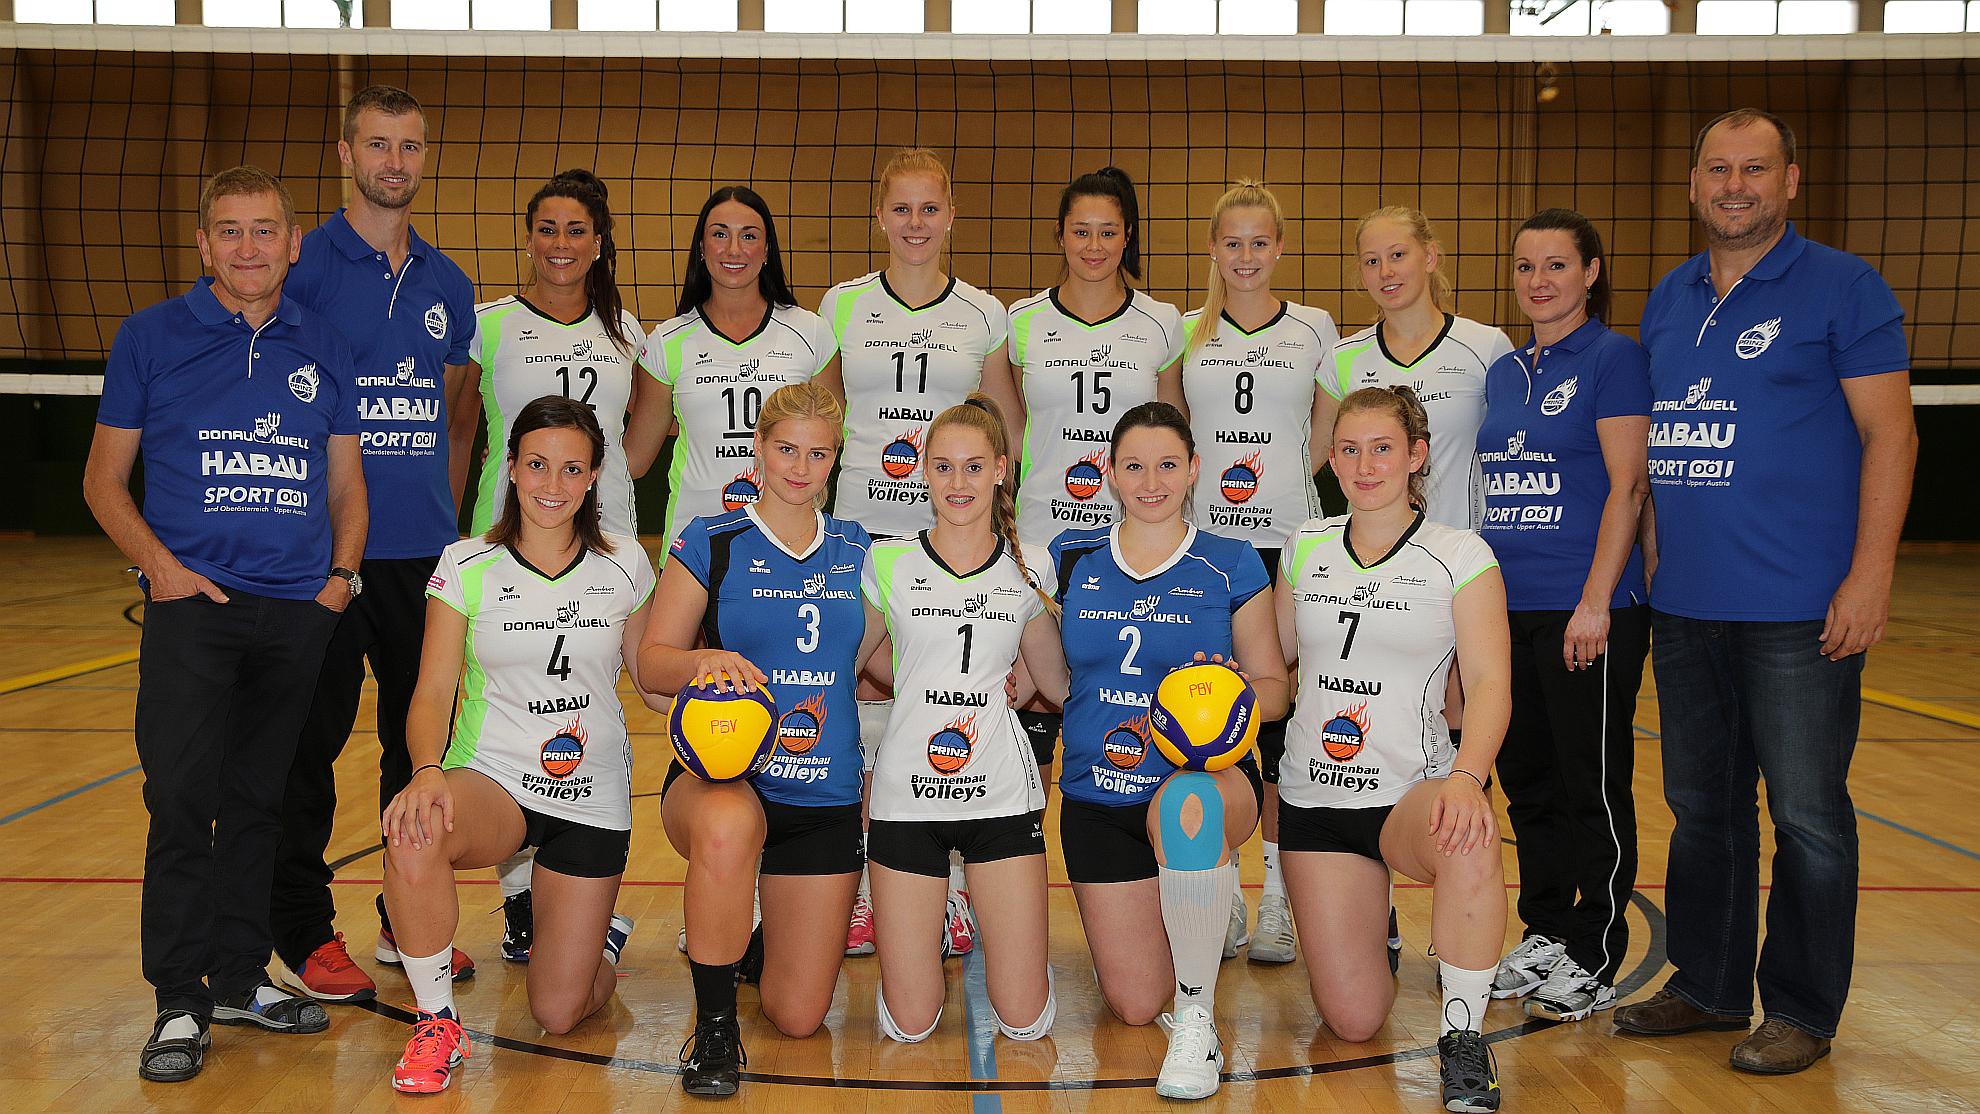 SG Prinz Brunnenbau Volleys 2019 - FOTO © GEPA pictures/Walter Luger